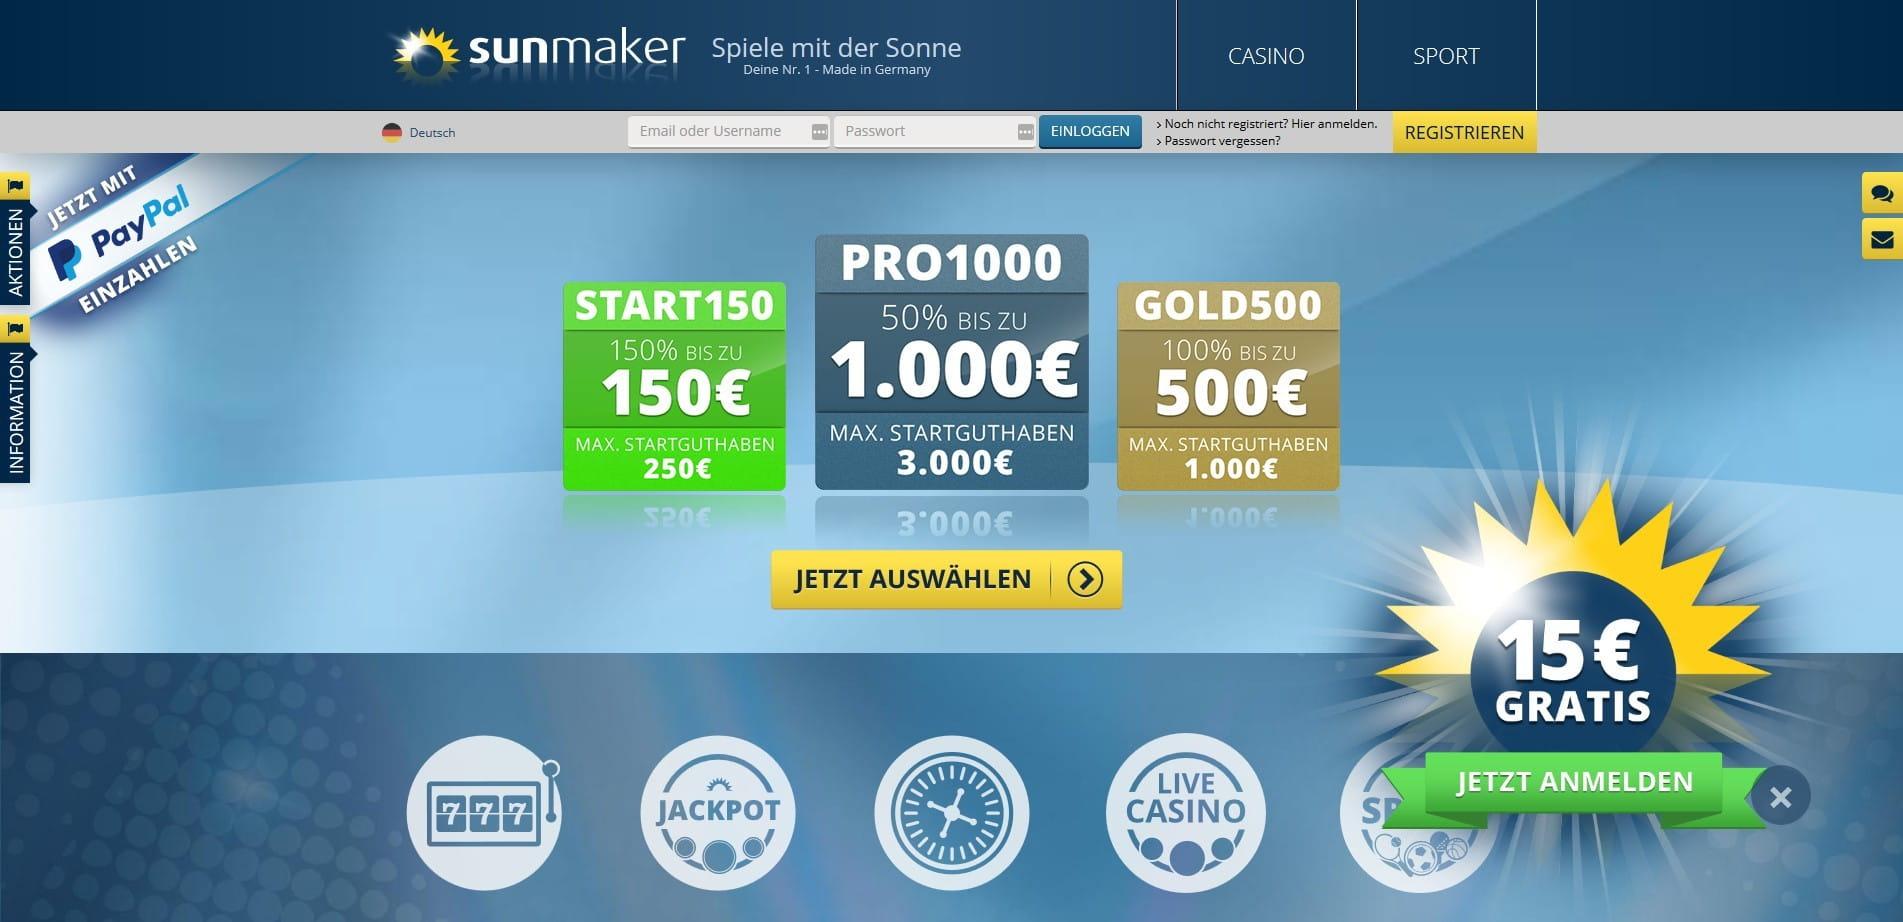 besten deutschen online casinos boom of ra